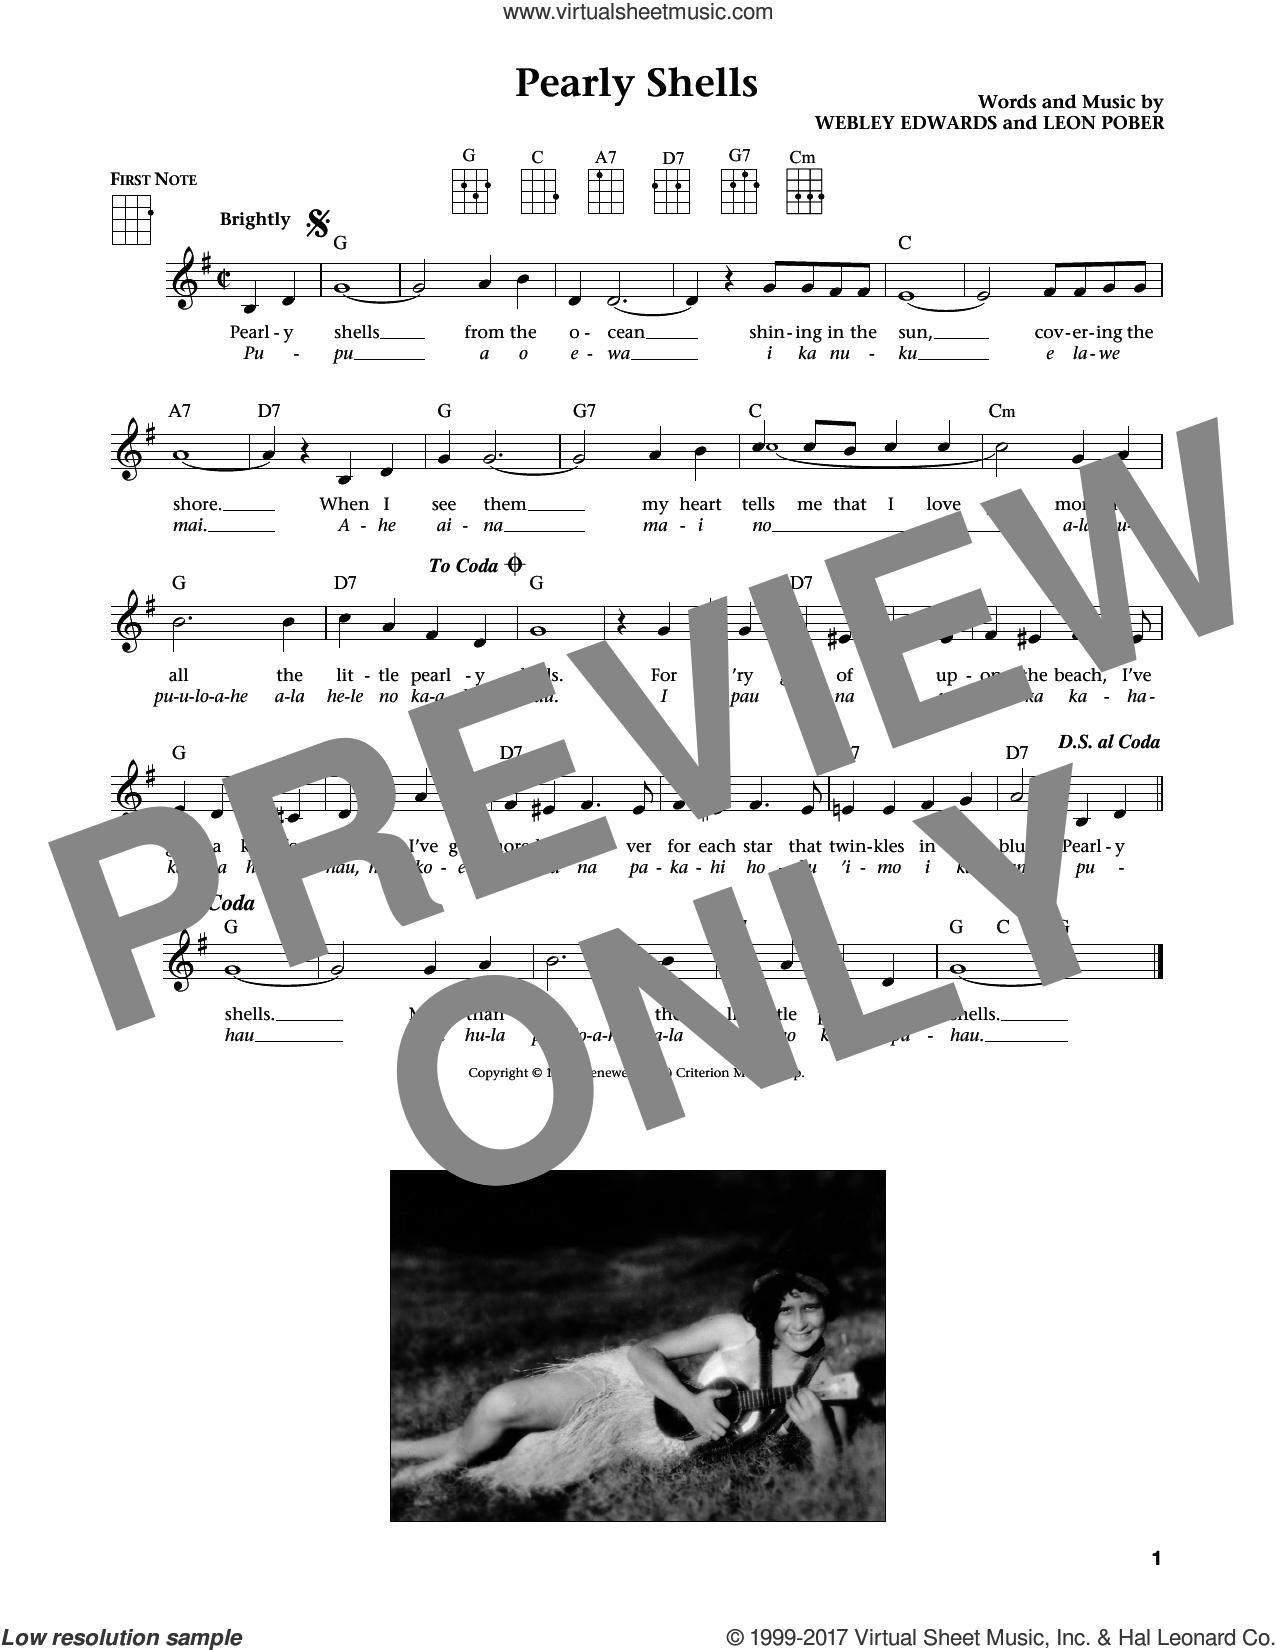 Pearly Shells (Pupu O Ewa) (from The Daily Ukulele) (arr. Liz and Jim Beloff) sheet music for ukulele by Leon Pober, Jim Beloff, Liz Beloff and Webley Edwards, intermediate skill level